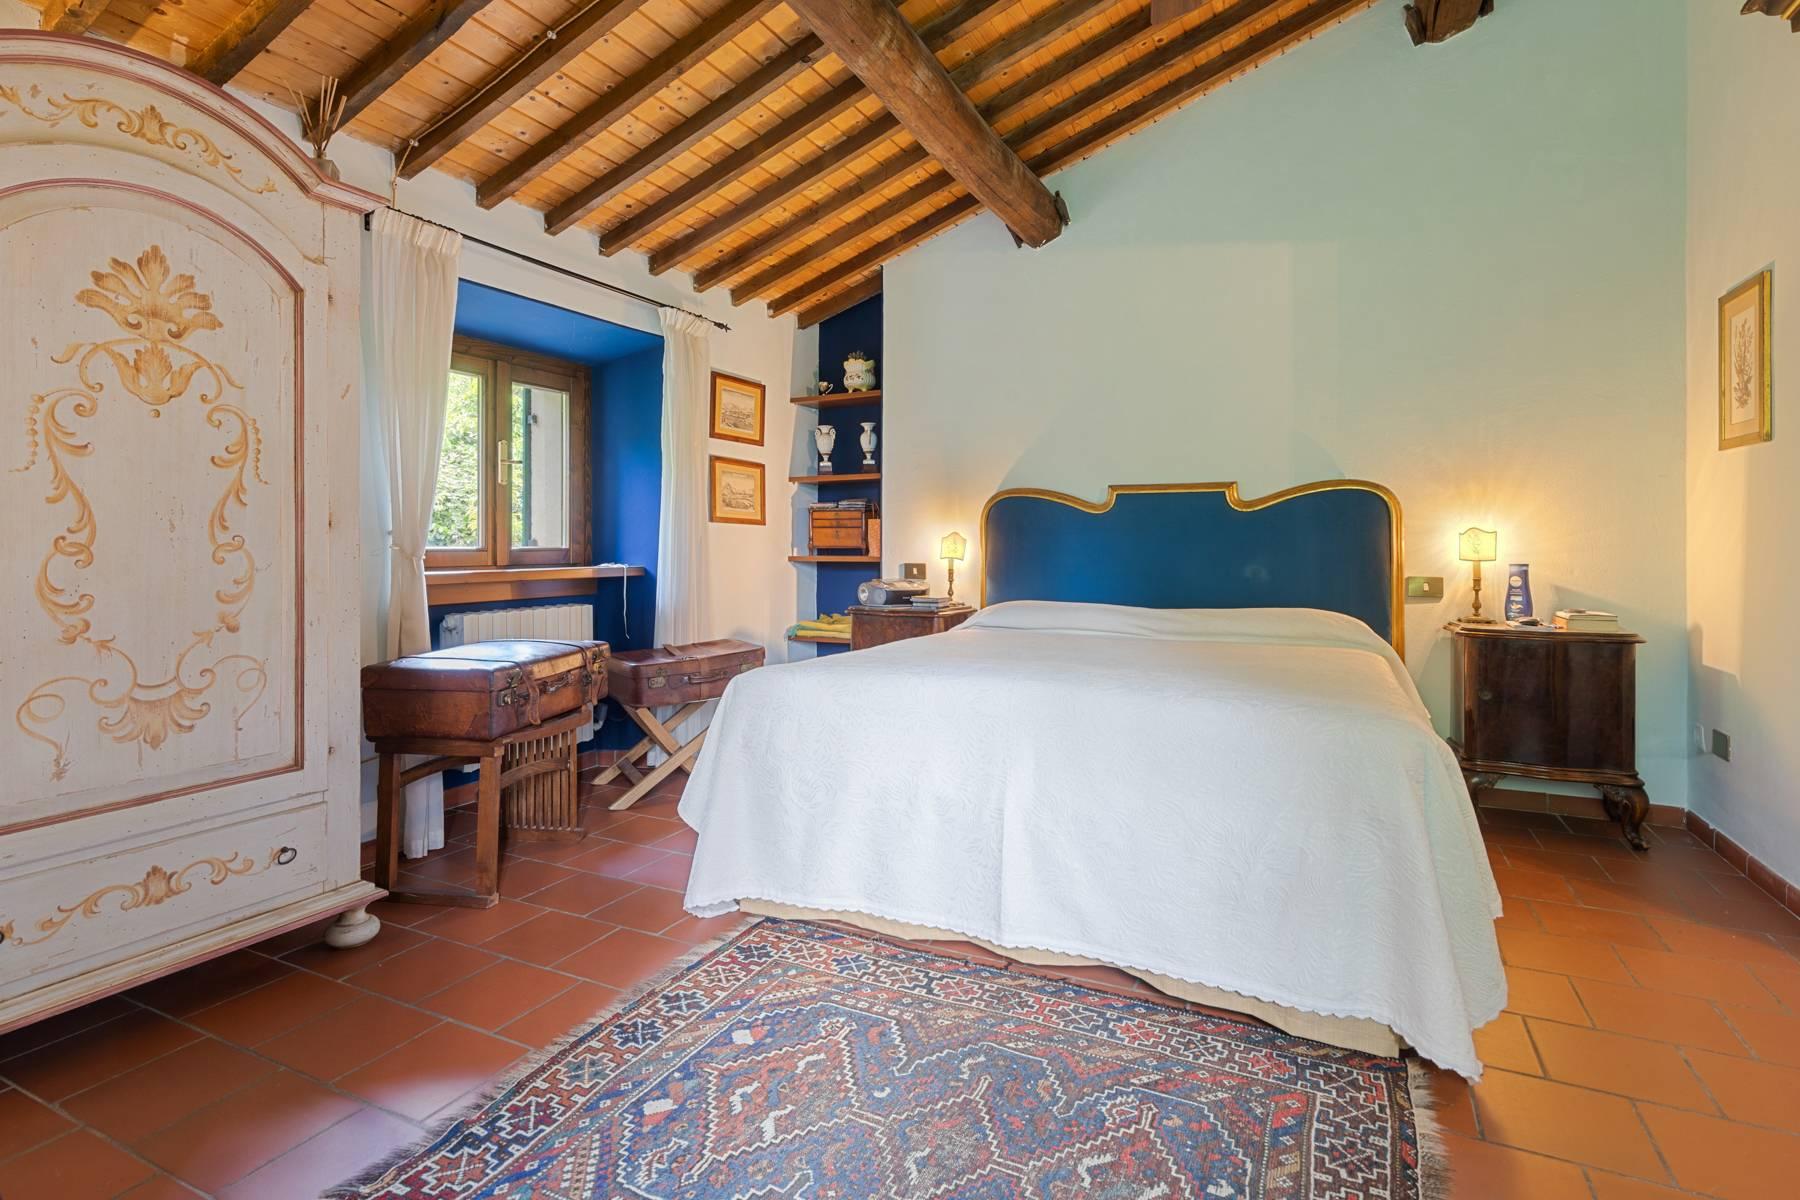 Villa in Vendita a Verona: 5 locali, 2400 mq - Foto 28